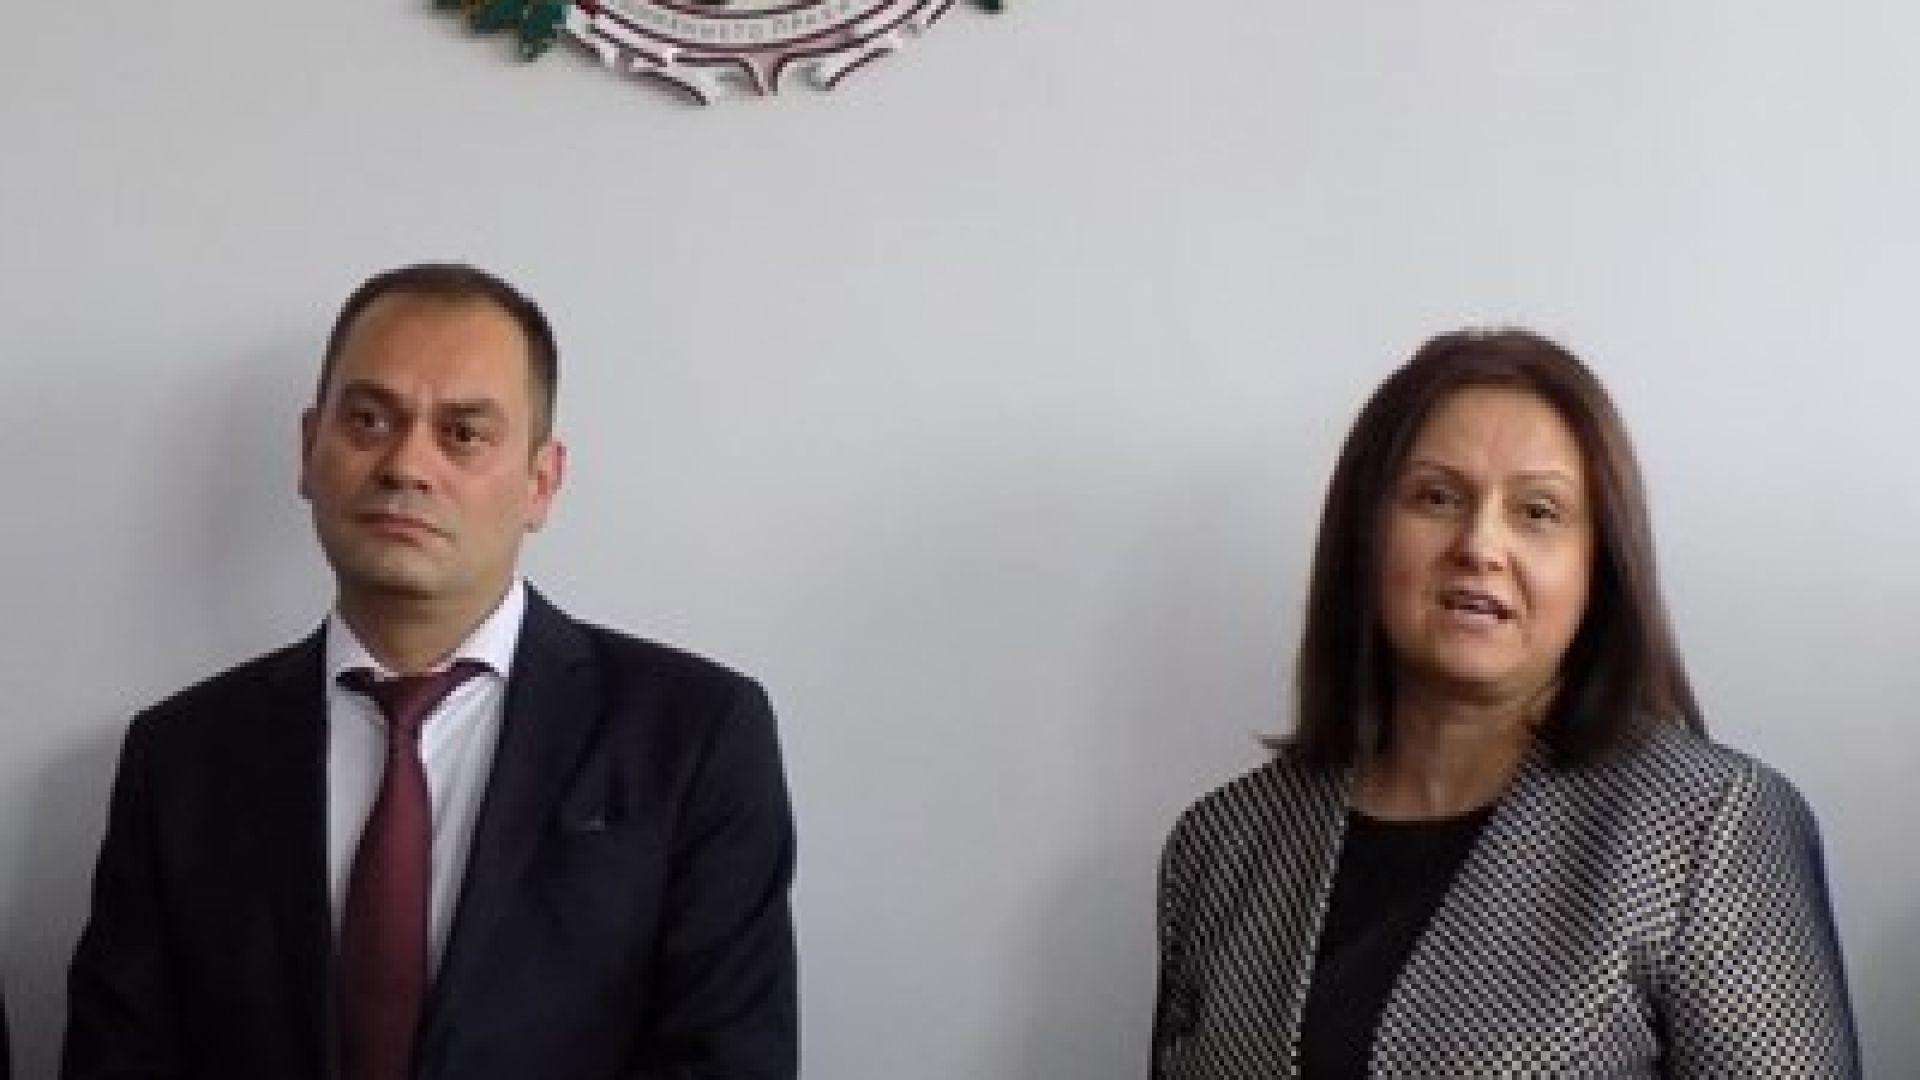 Новият административен ръководител на Софийската апелативна прокуратура (САП) Радослав Димов